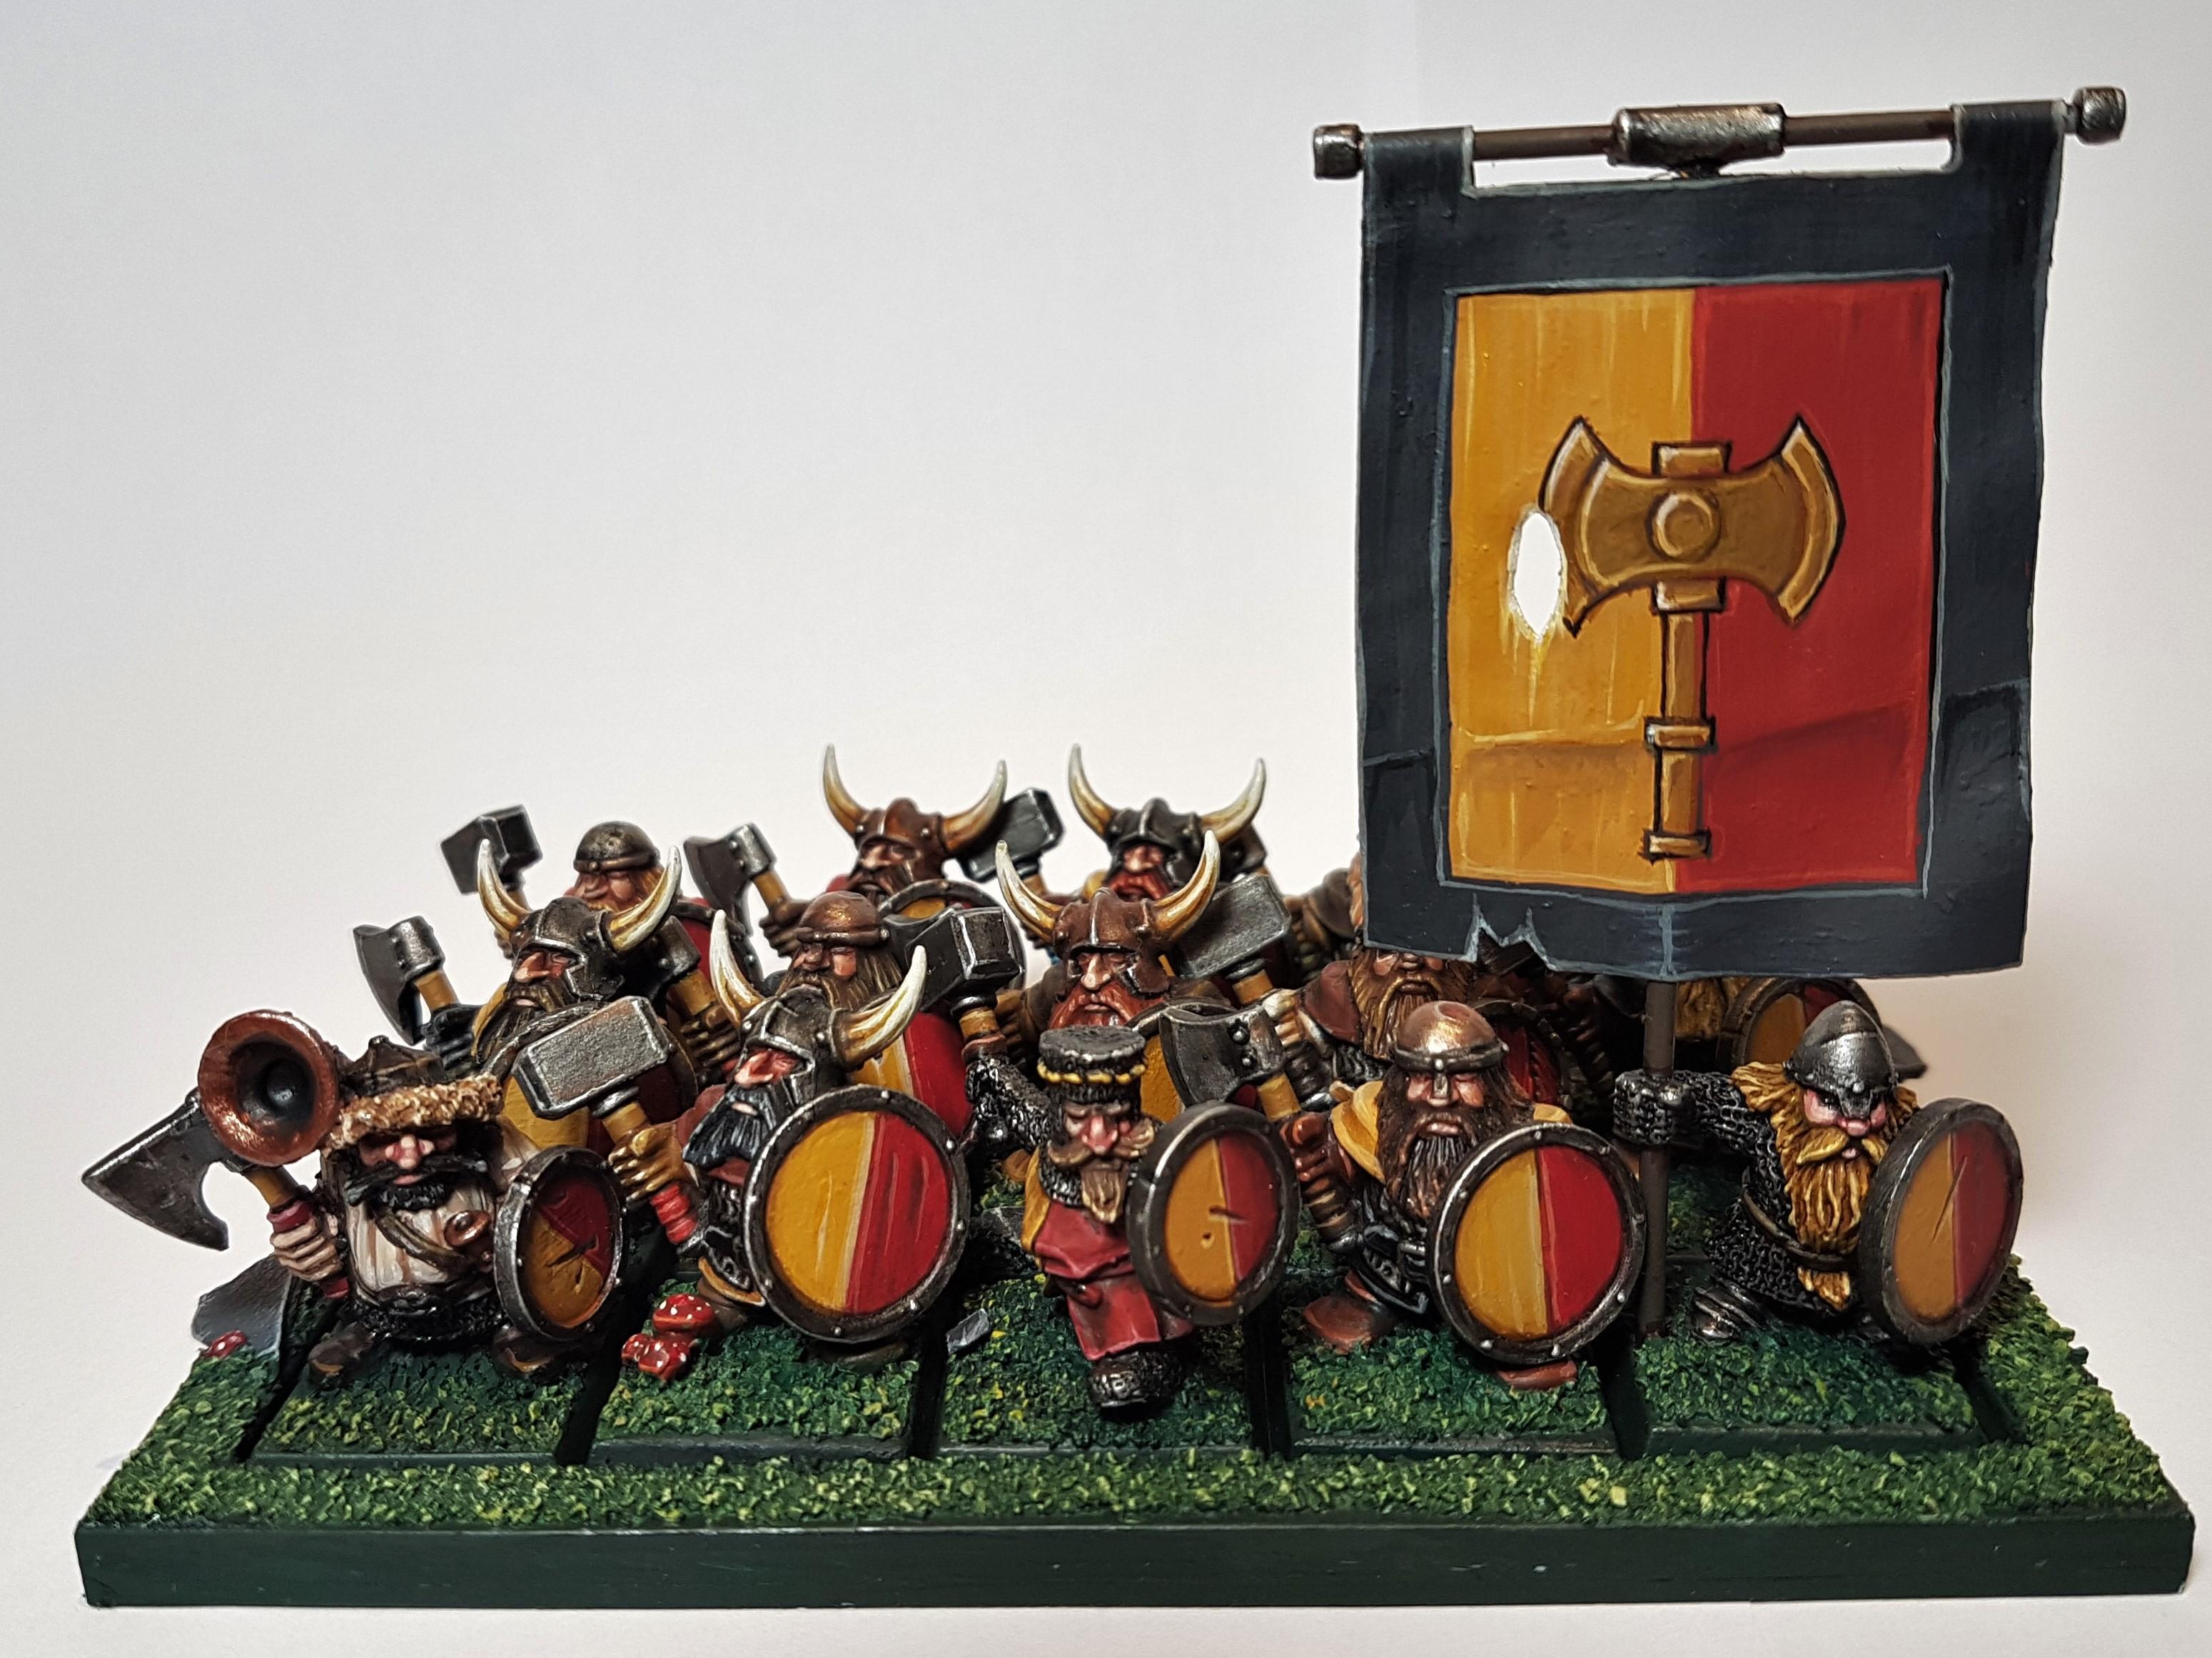 Clansmen Main